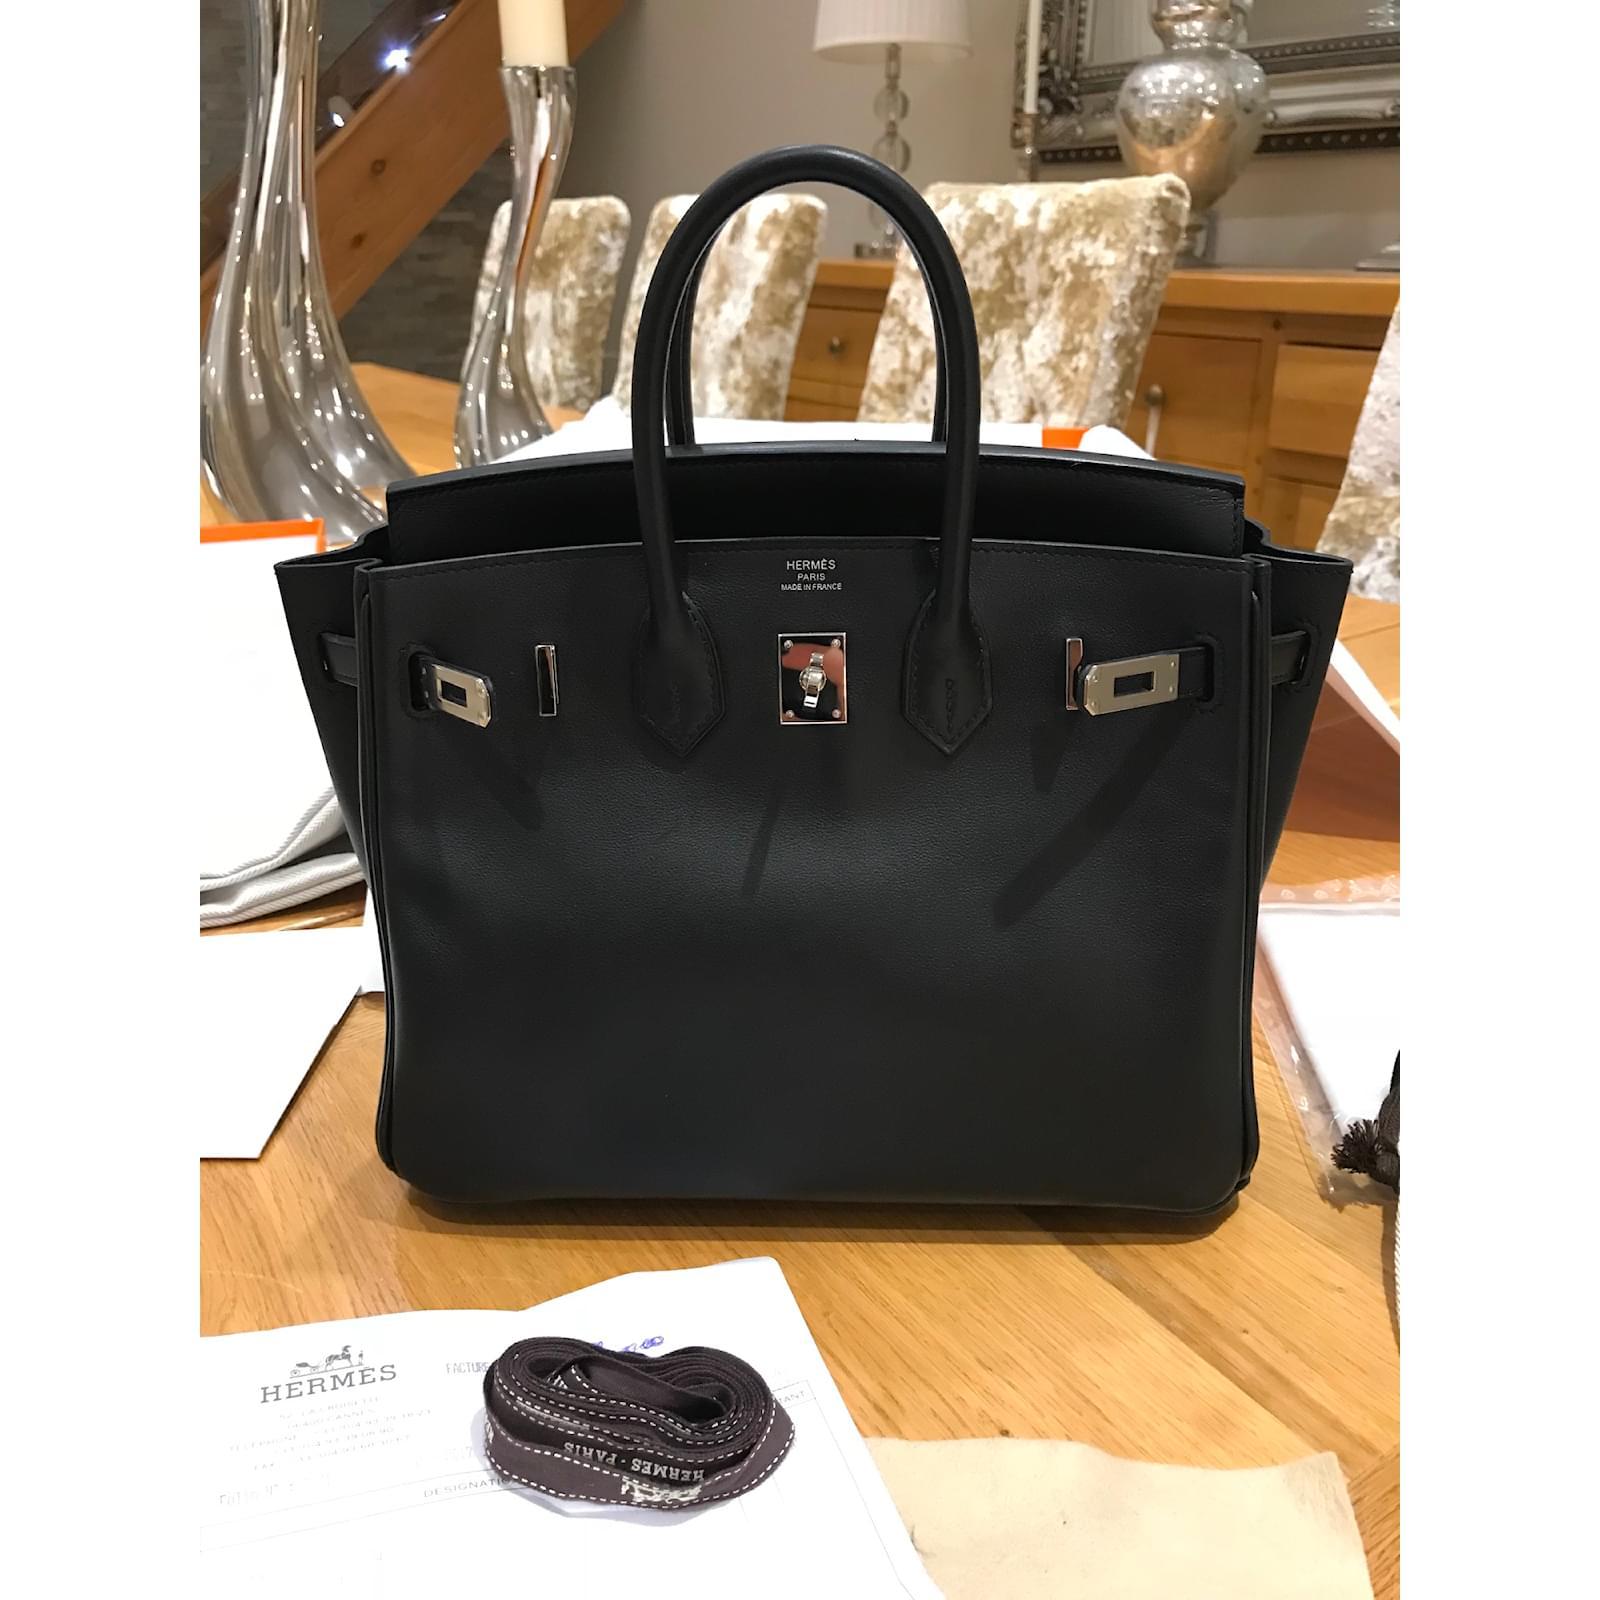 a652aa04ea ... new style hermès hermes birkin 25 handbags leather black ref.51521 joli  closet 839e3 7dec5